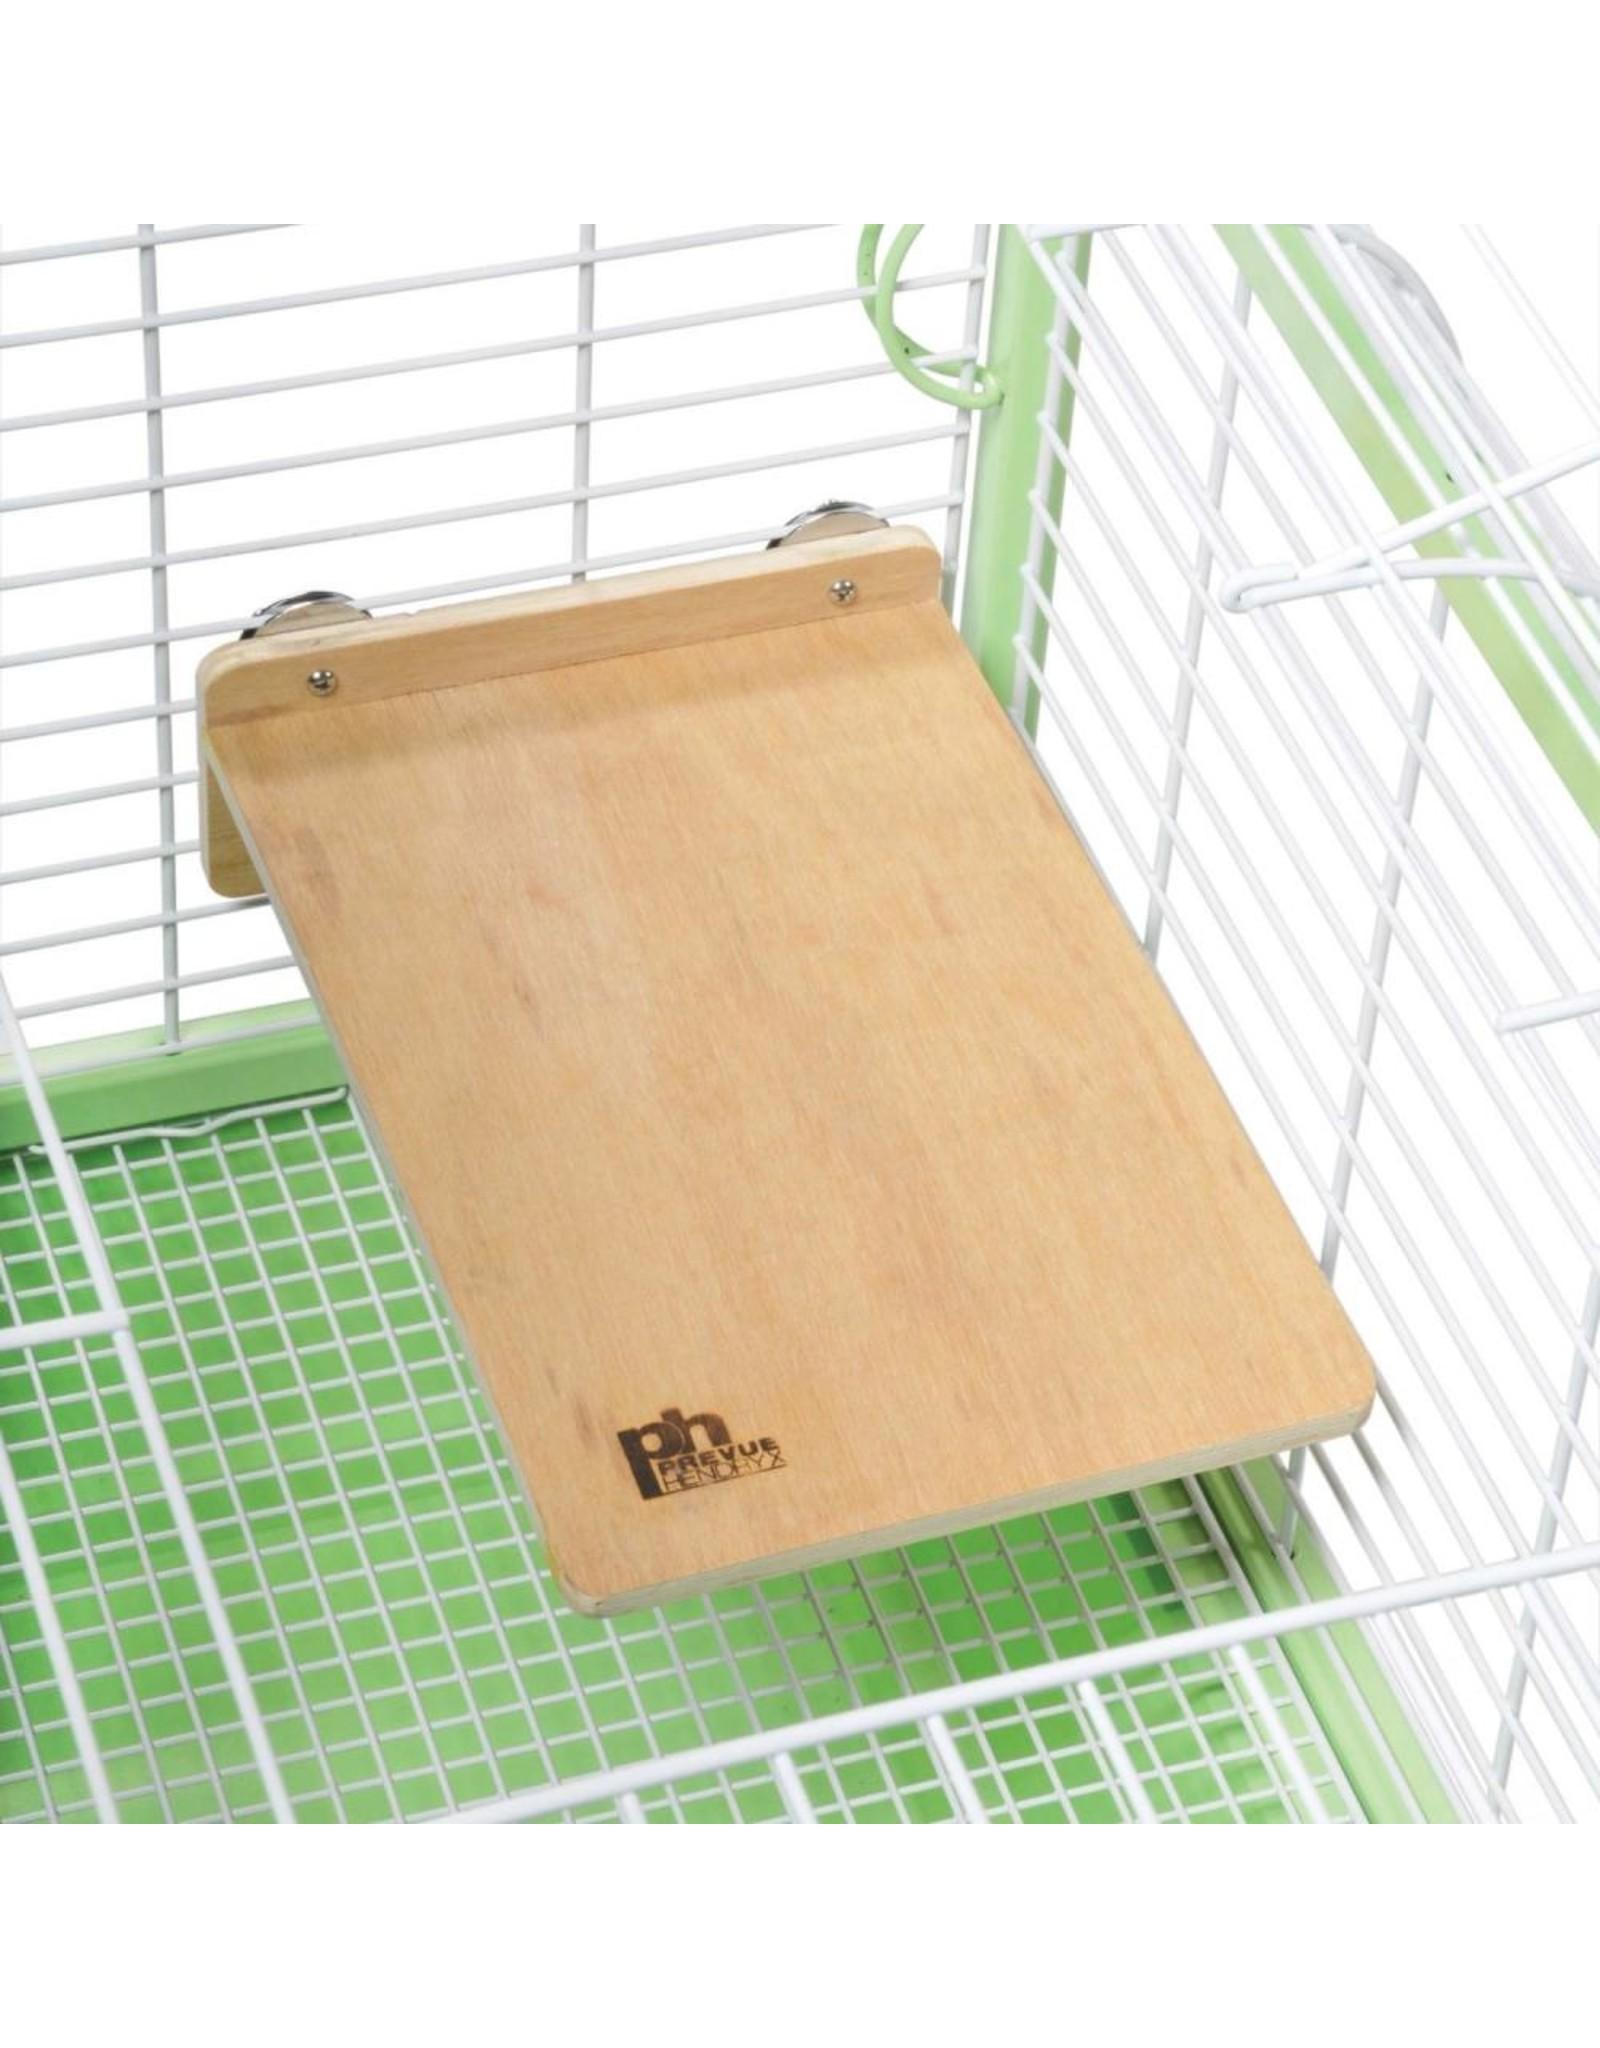 Prevue PREVUE Wood Platform Large